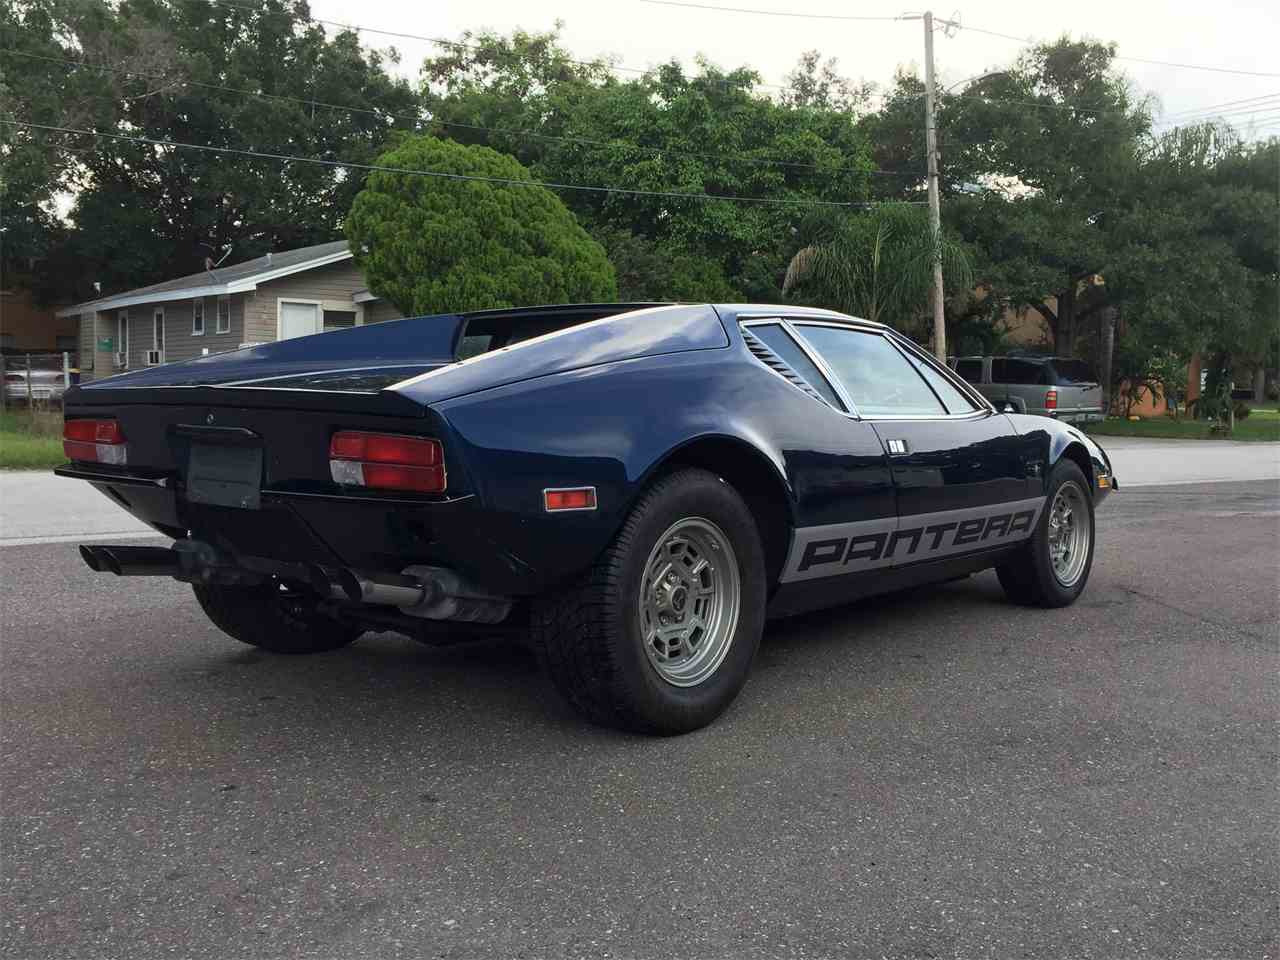 1974 DETMASO Pantera for Sale | ClassicCars.com | CC-1013562